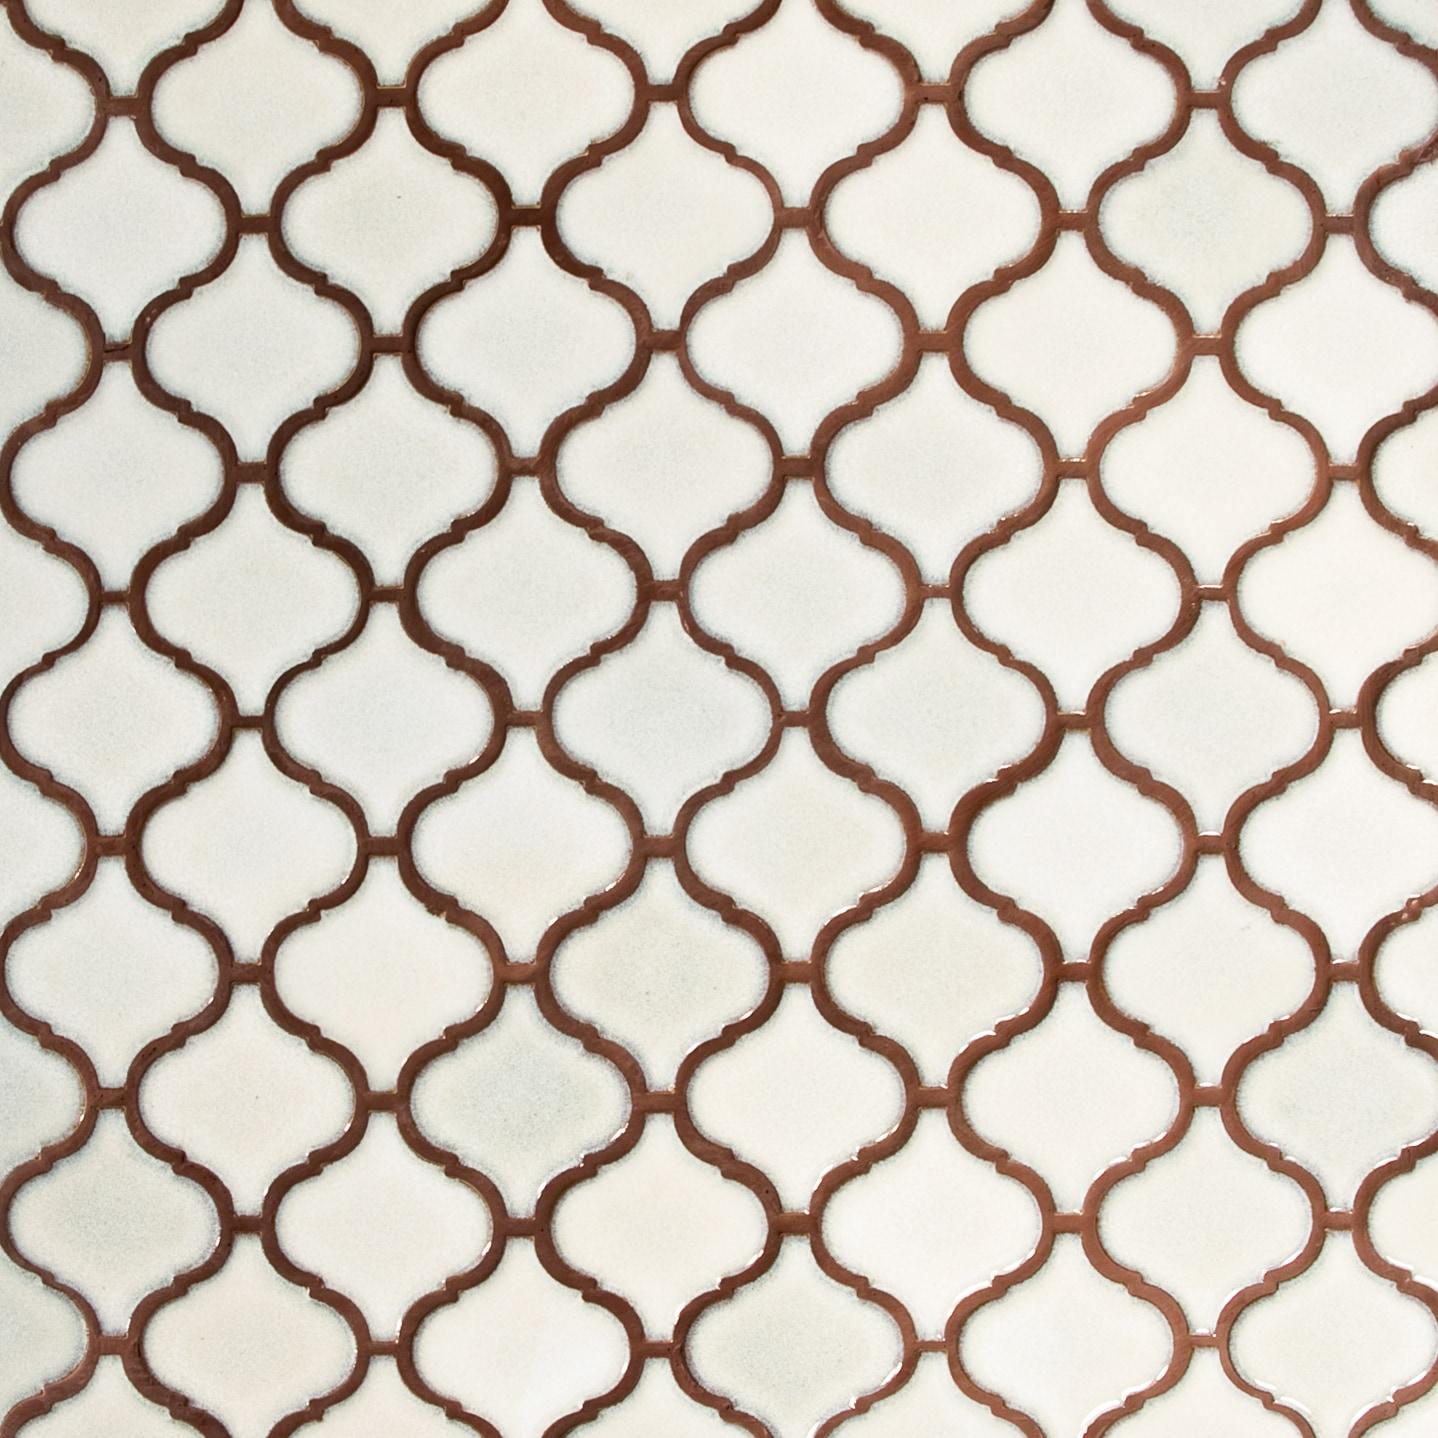 "Antique White, Wide Pattern / 3""x3"" / Glossy Arabesque Lantern Mosaics 0"